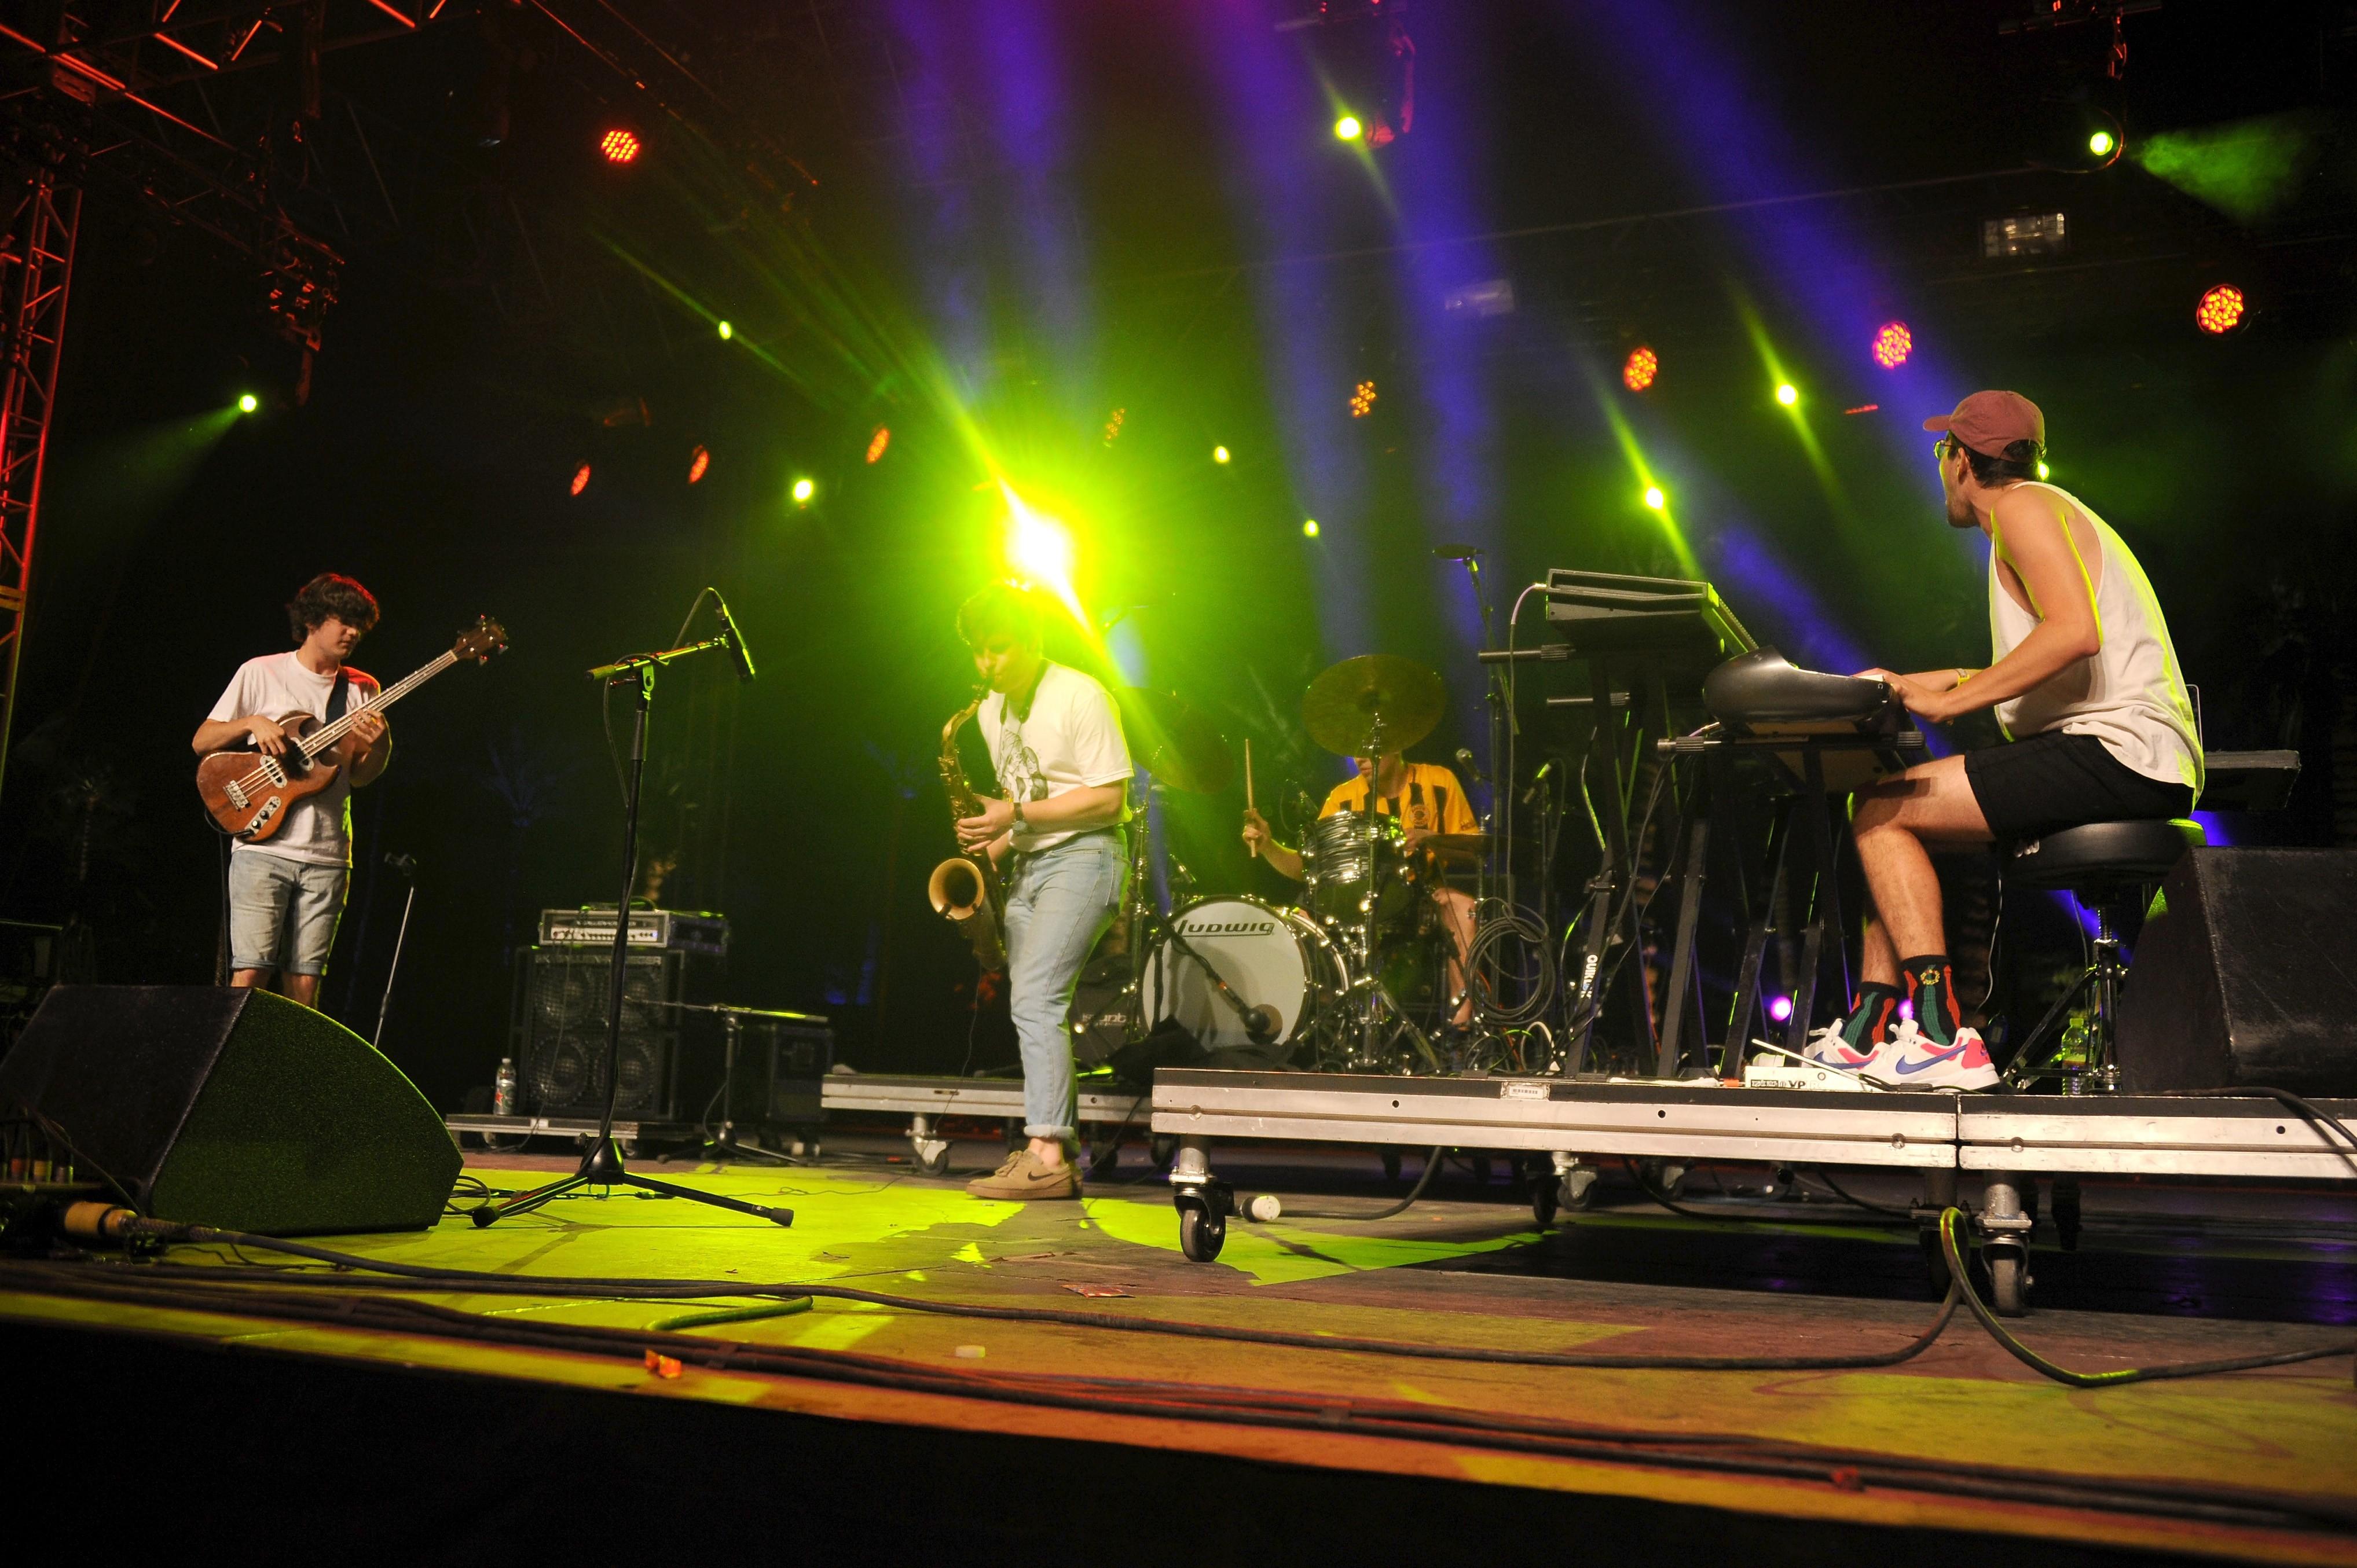 BADBADNOTGOOD at 2016 Coachella Valley Music And Arts Festival - Weekend 2 - Day 2